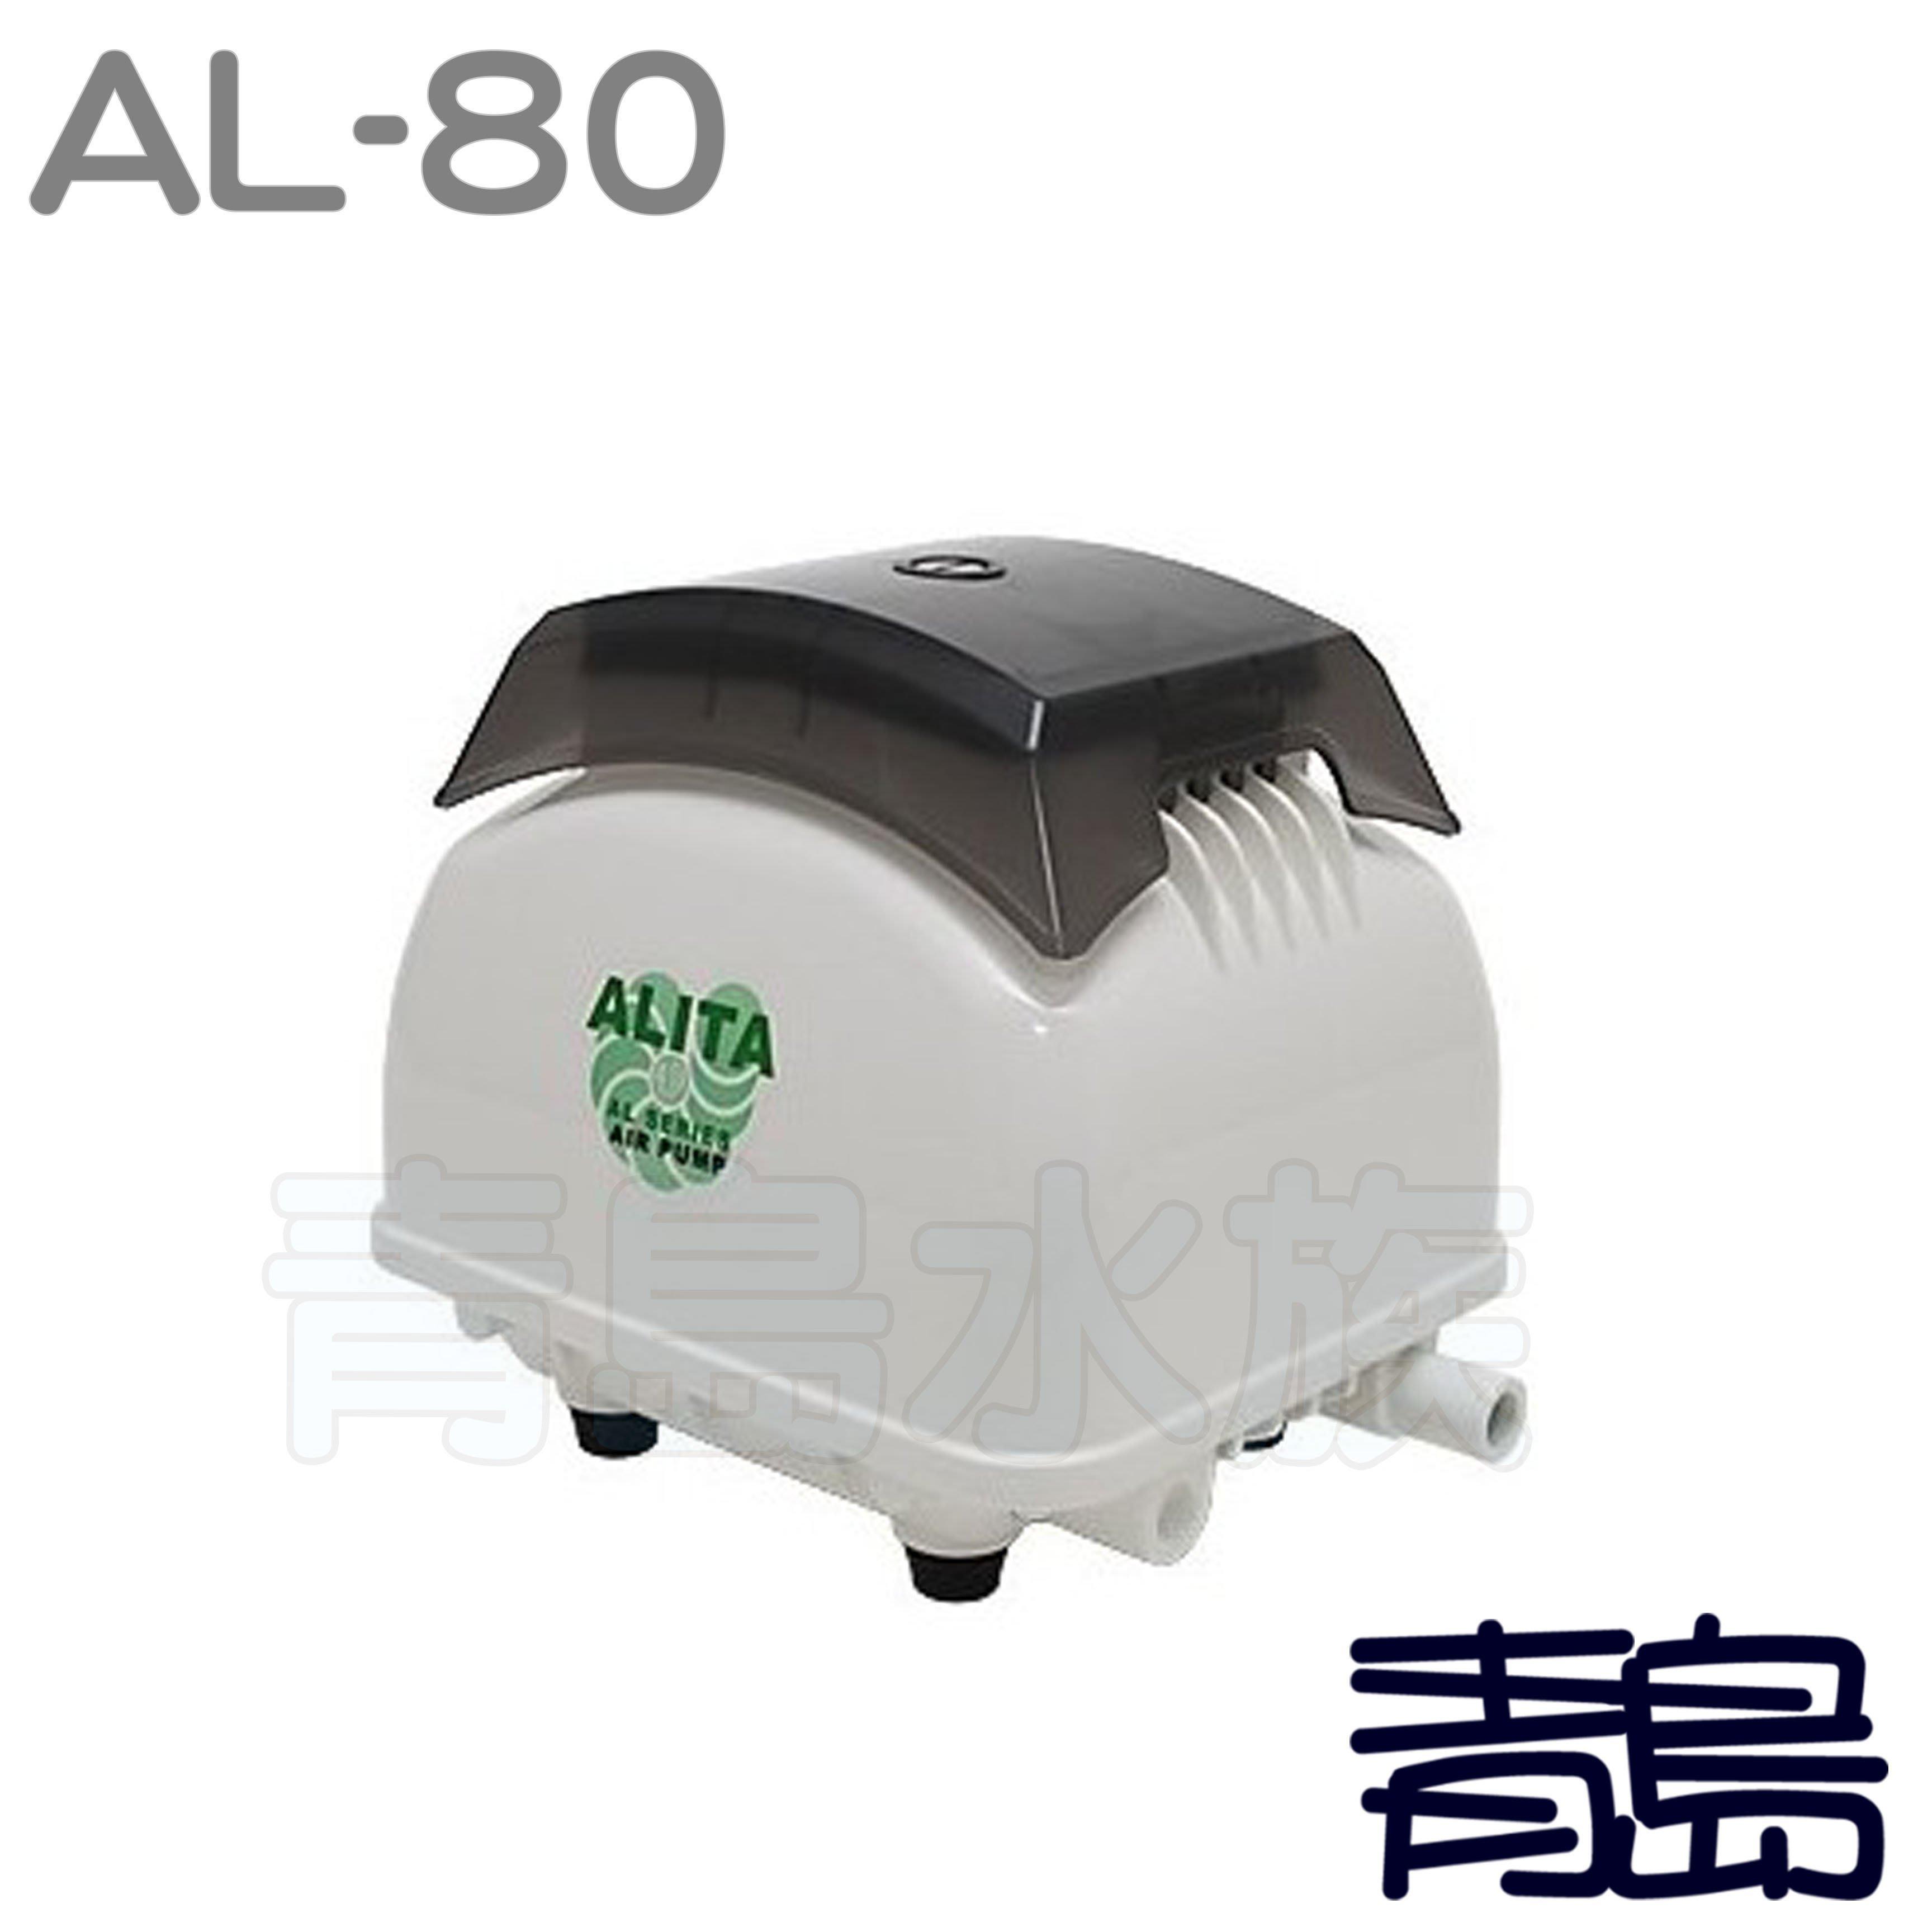 BT。。。青島水族。。。AL-80台灣ALITA亞立達--靜音空氣泵浦 電磁式空氣壓縮機 打氣機 系統缸==80L